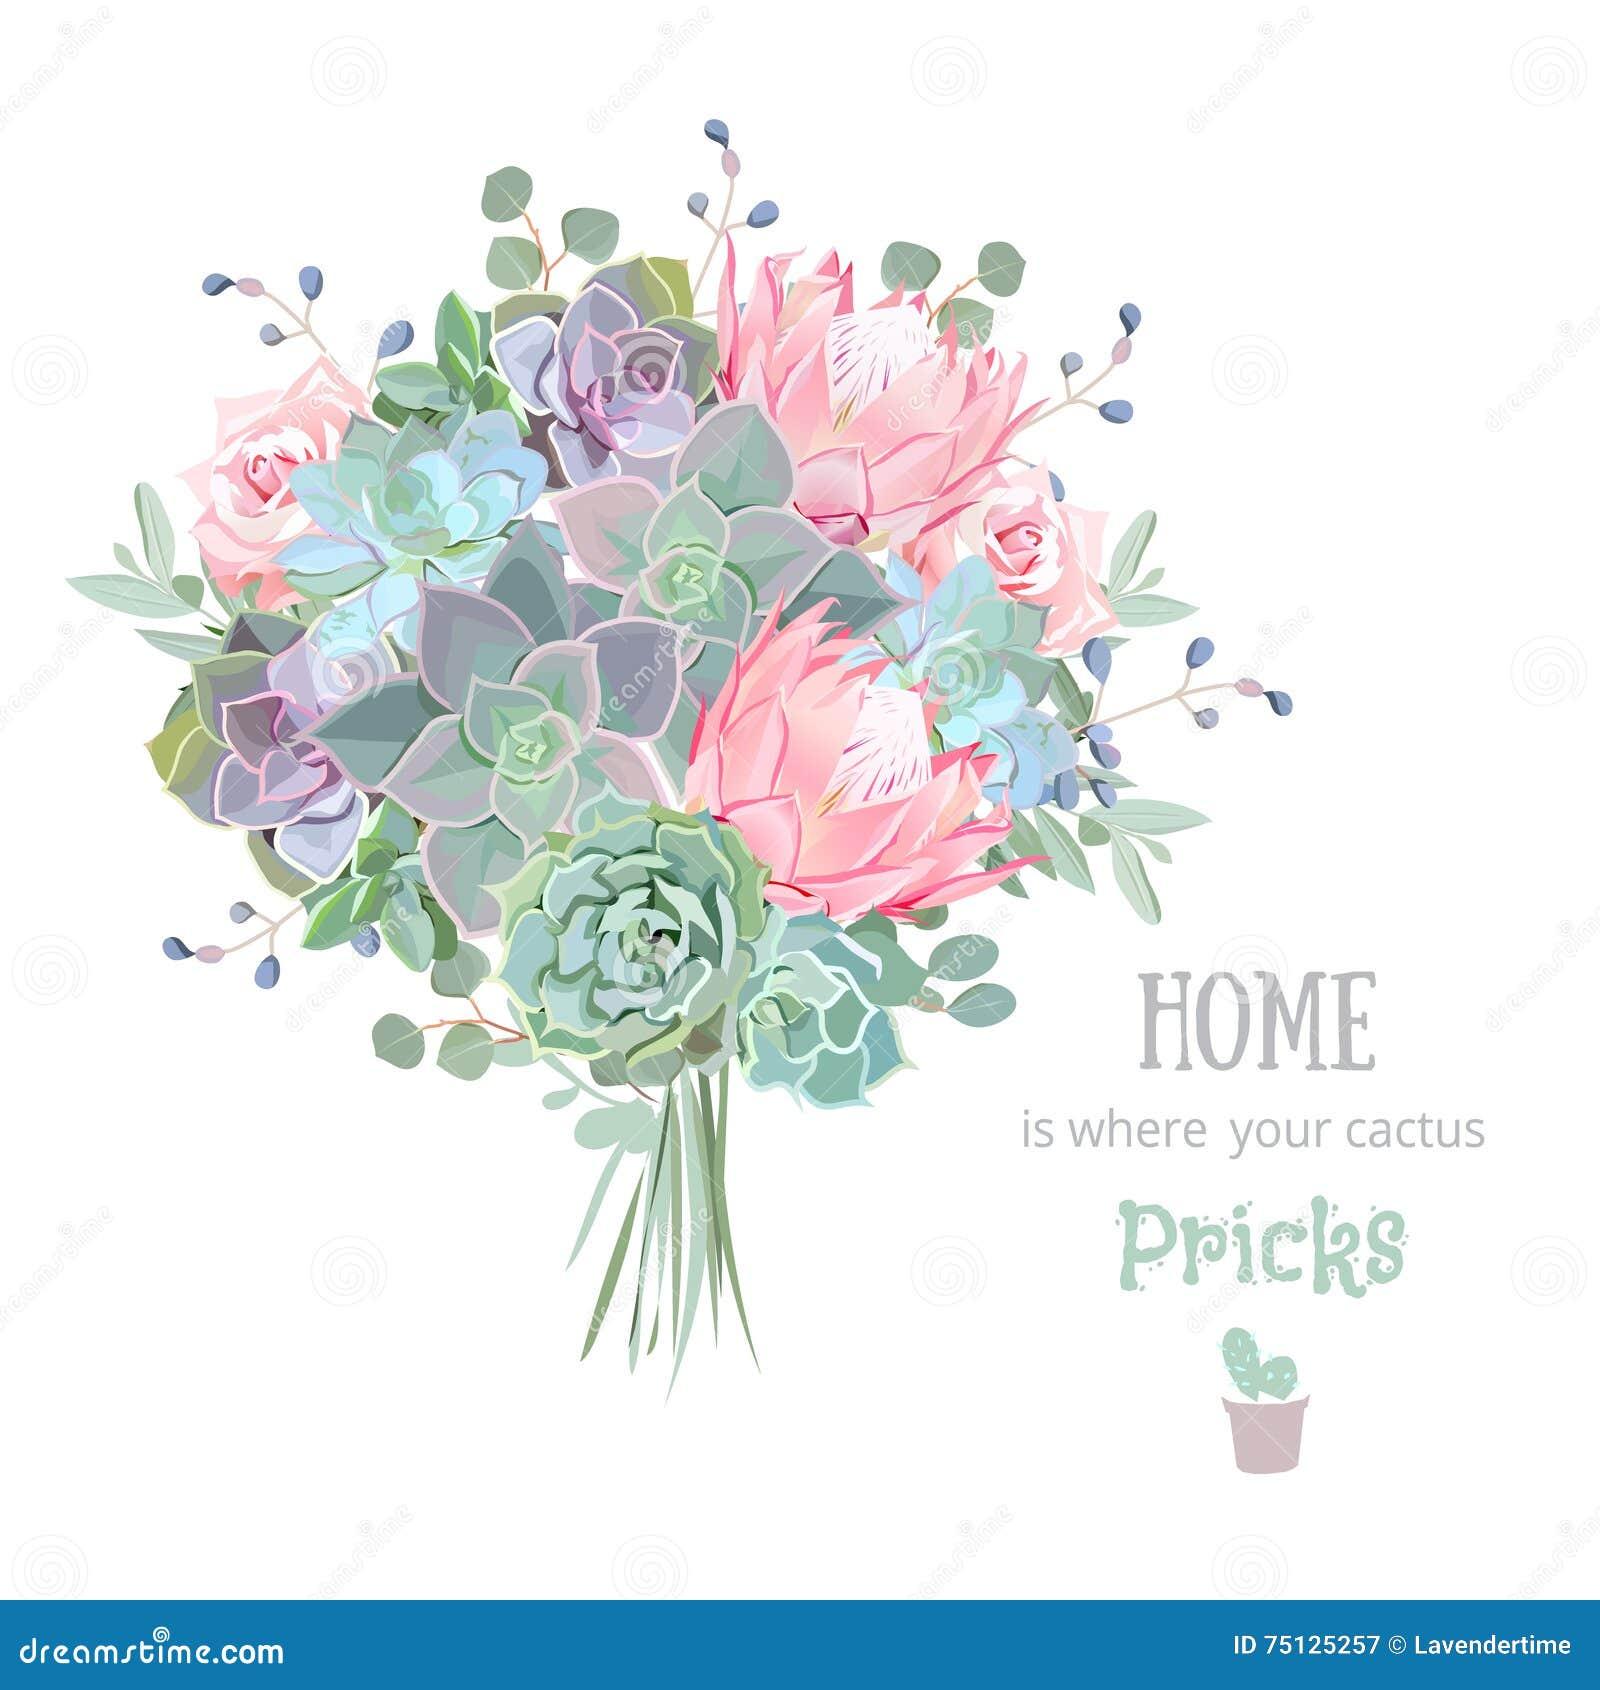 Green Colorful Succulents Vector Design Set Echeveria Protea Eucaliptus Stock Vector Illustration Of Funky Flowers 75125257